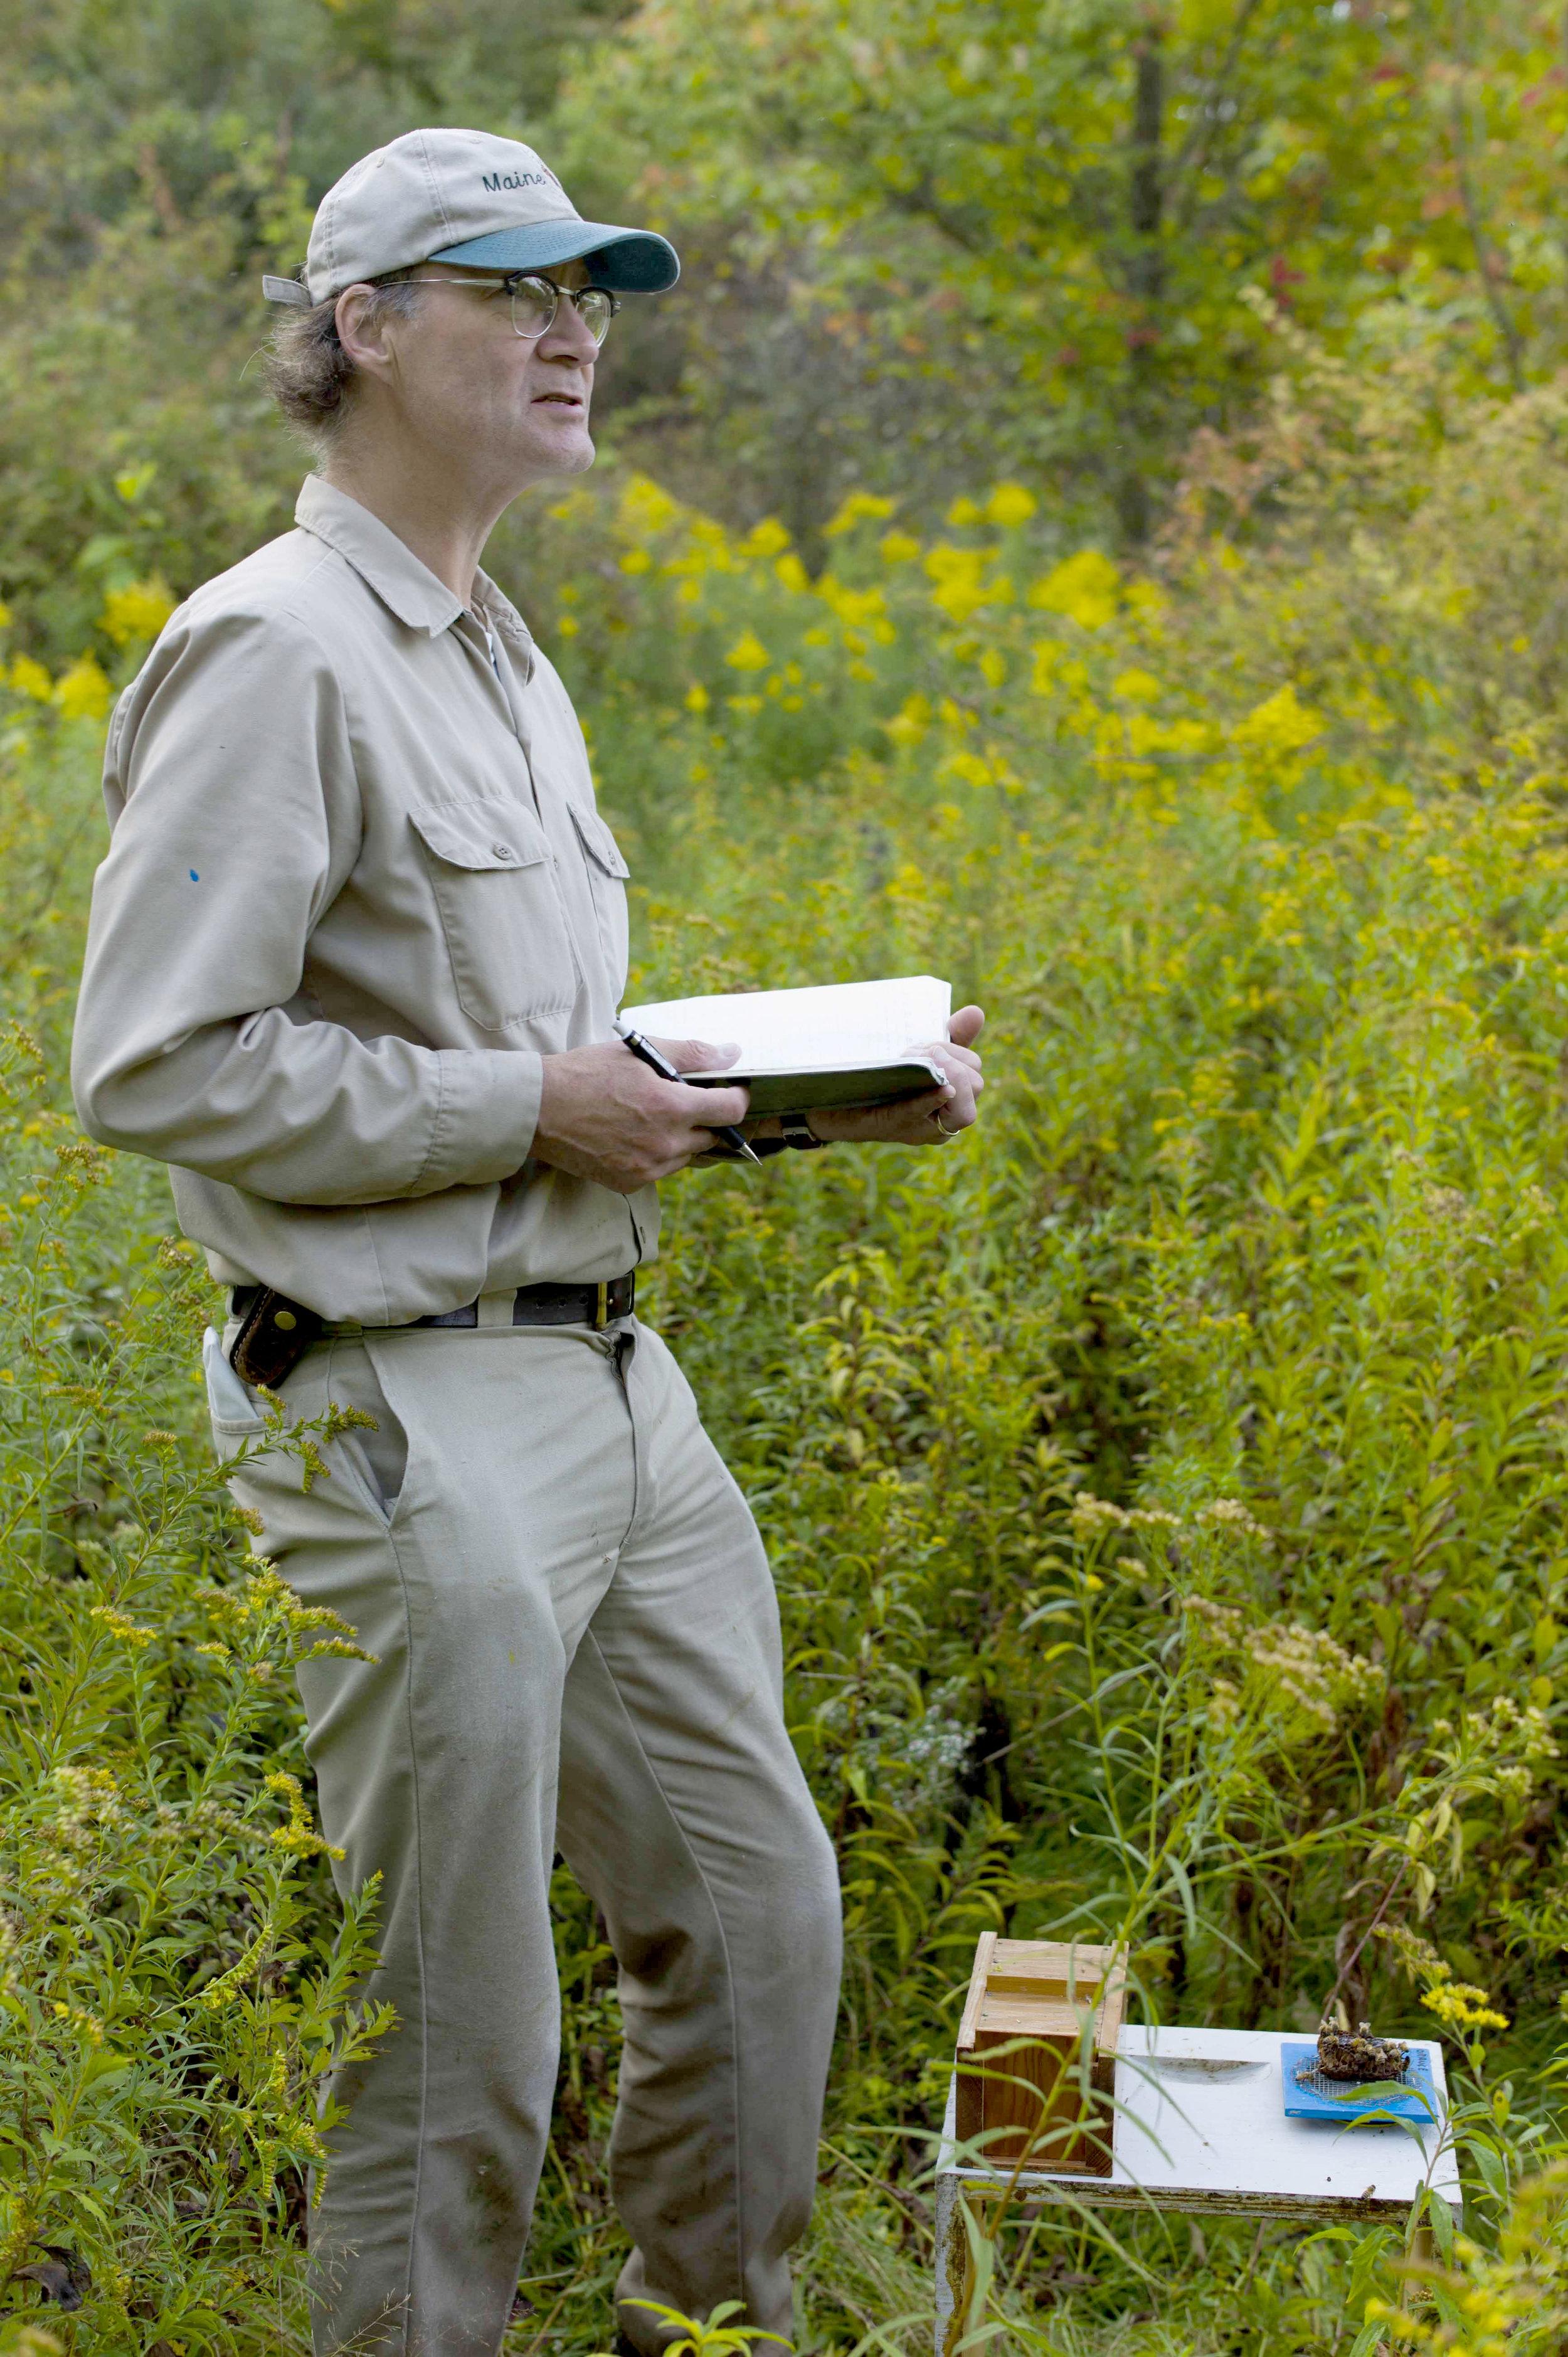 Seeley_Author_Photo_Bee_Hunting.jpg